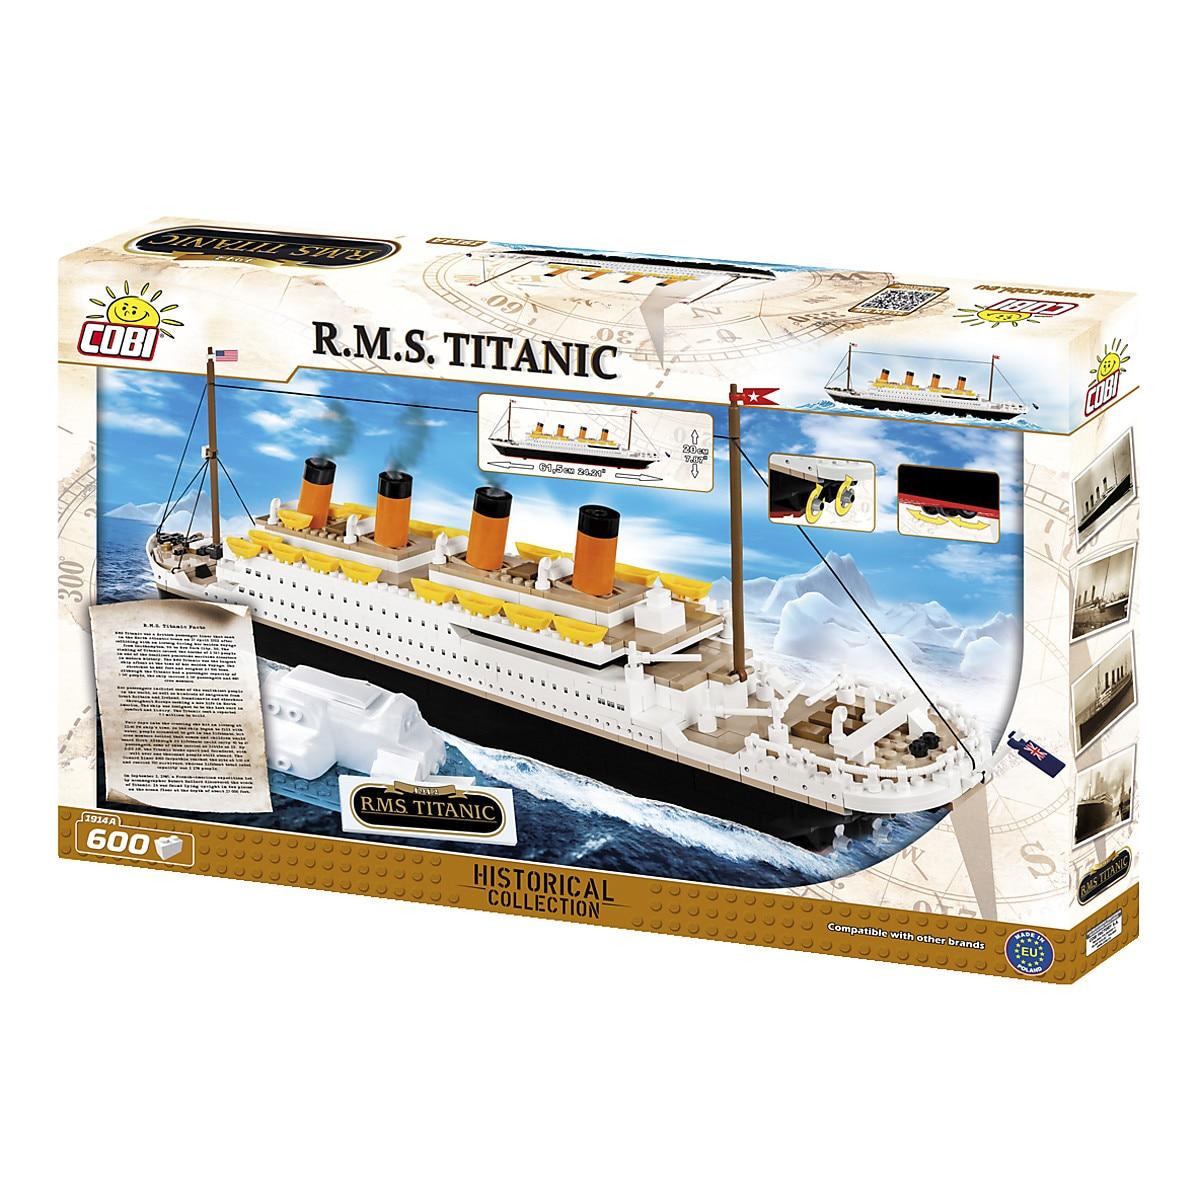 Byggklossar R.M.S. Titanic, Cobi